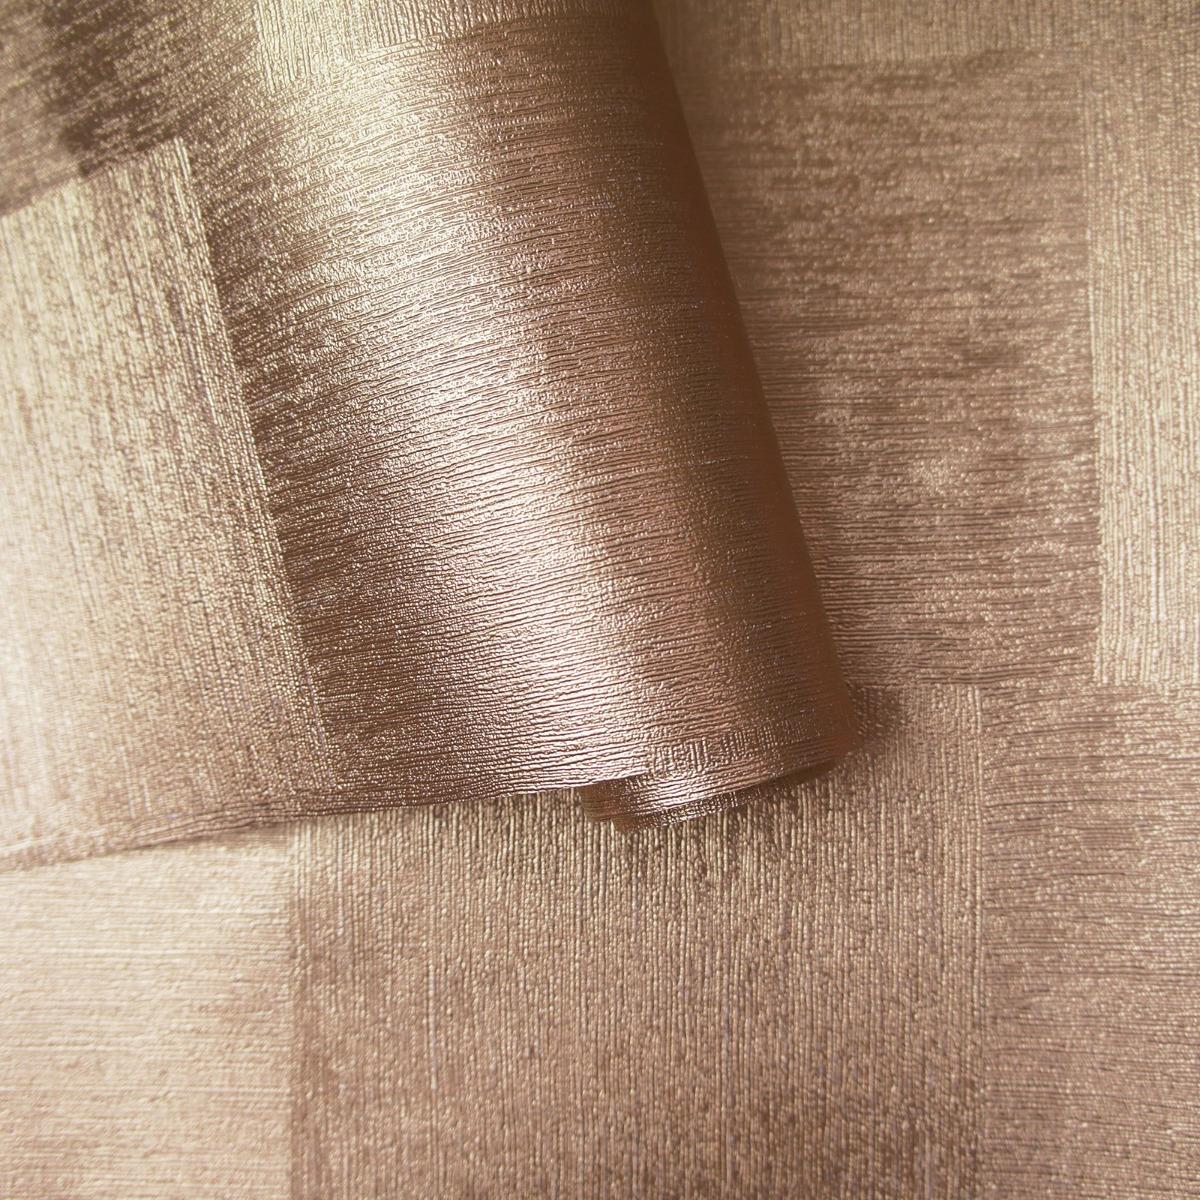 Minerals Indium Foil Wallpaper Copper Holden 35802